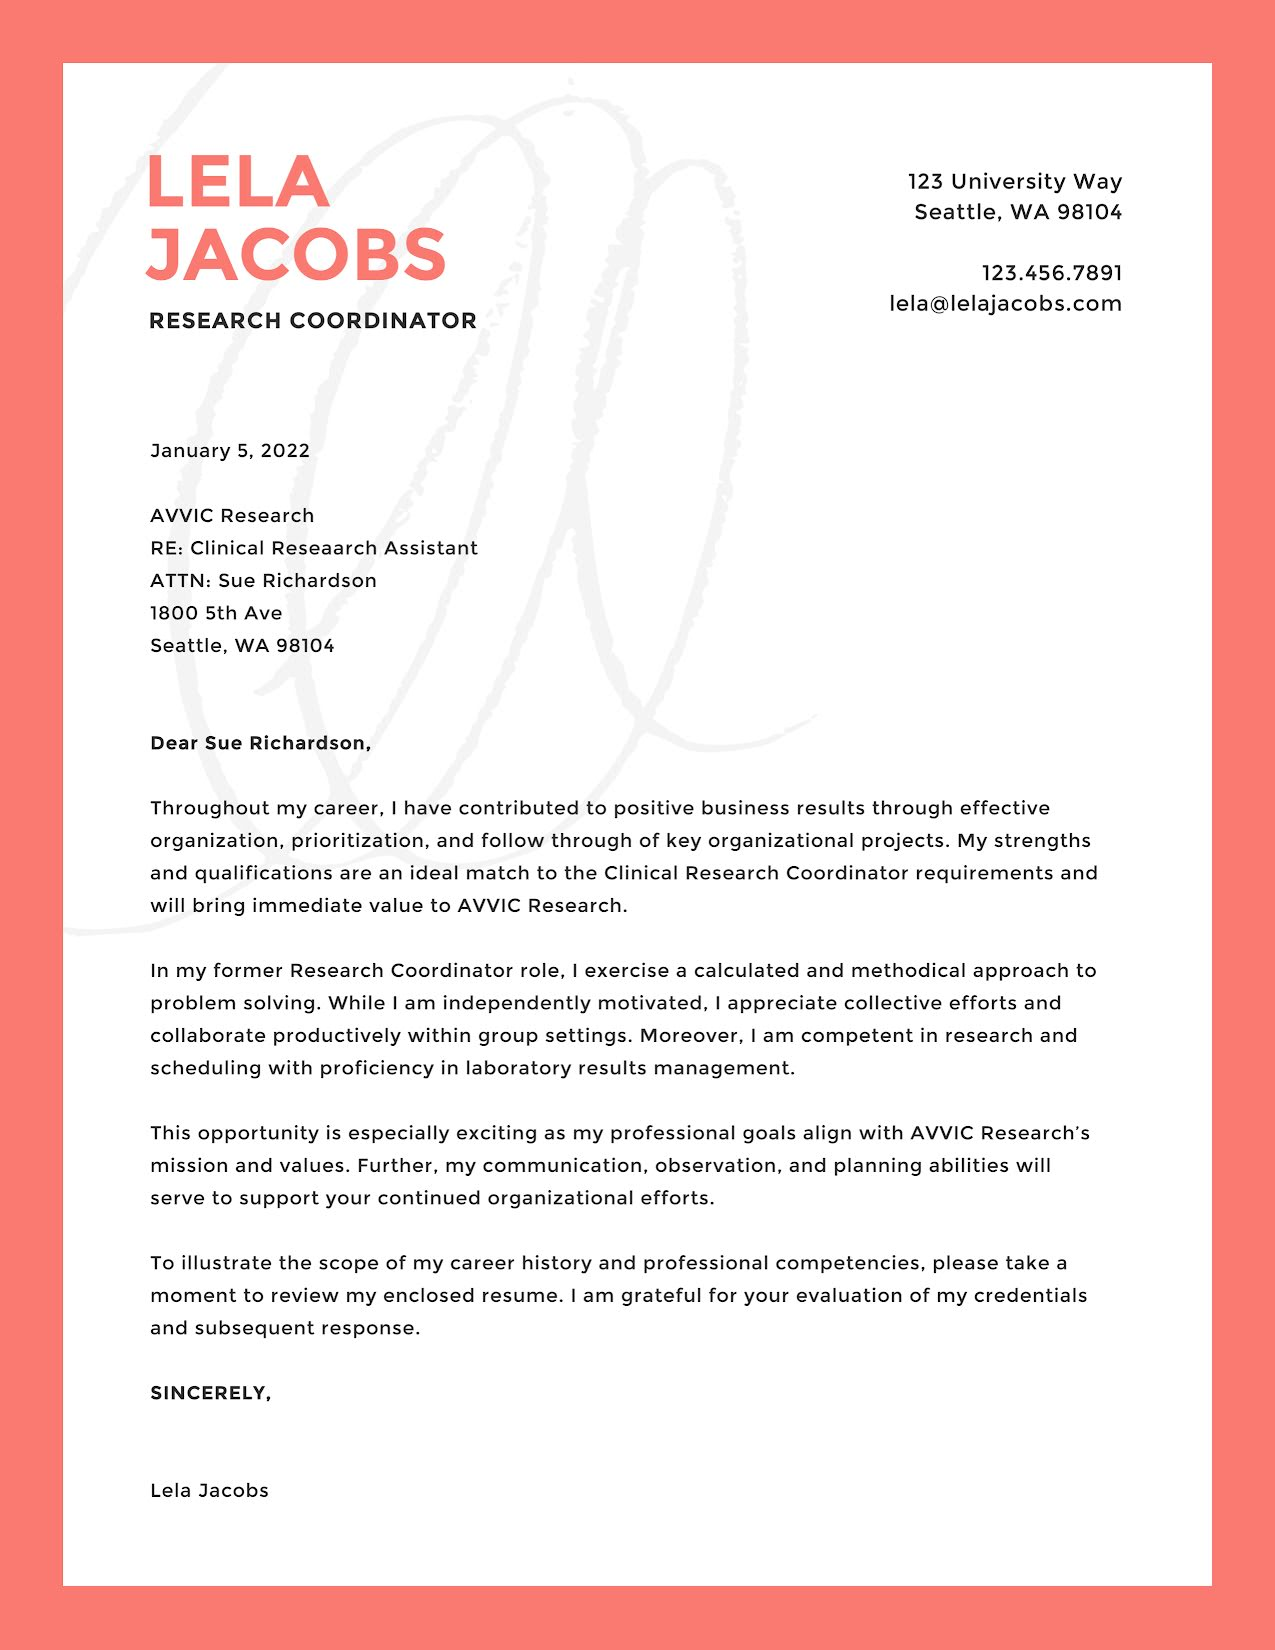 Lela Jacobs - Cover Letter Template